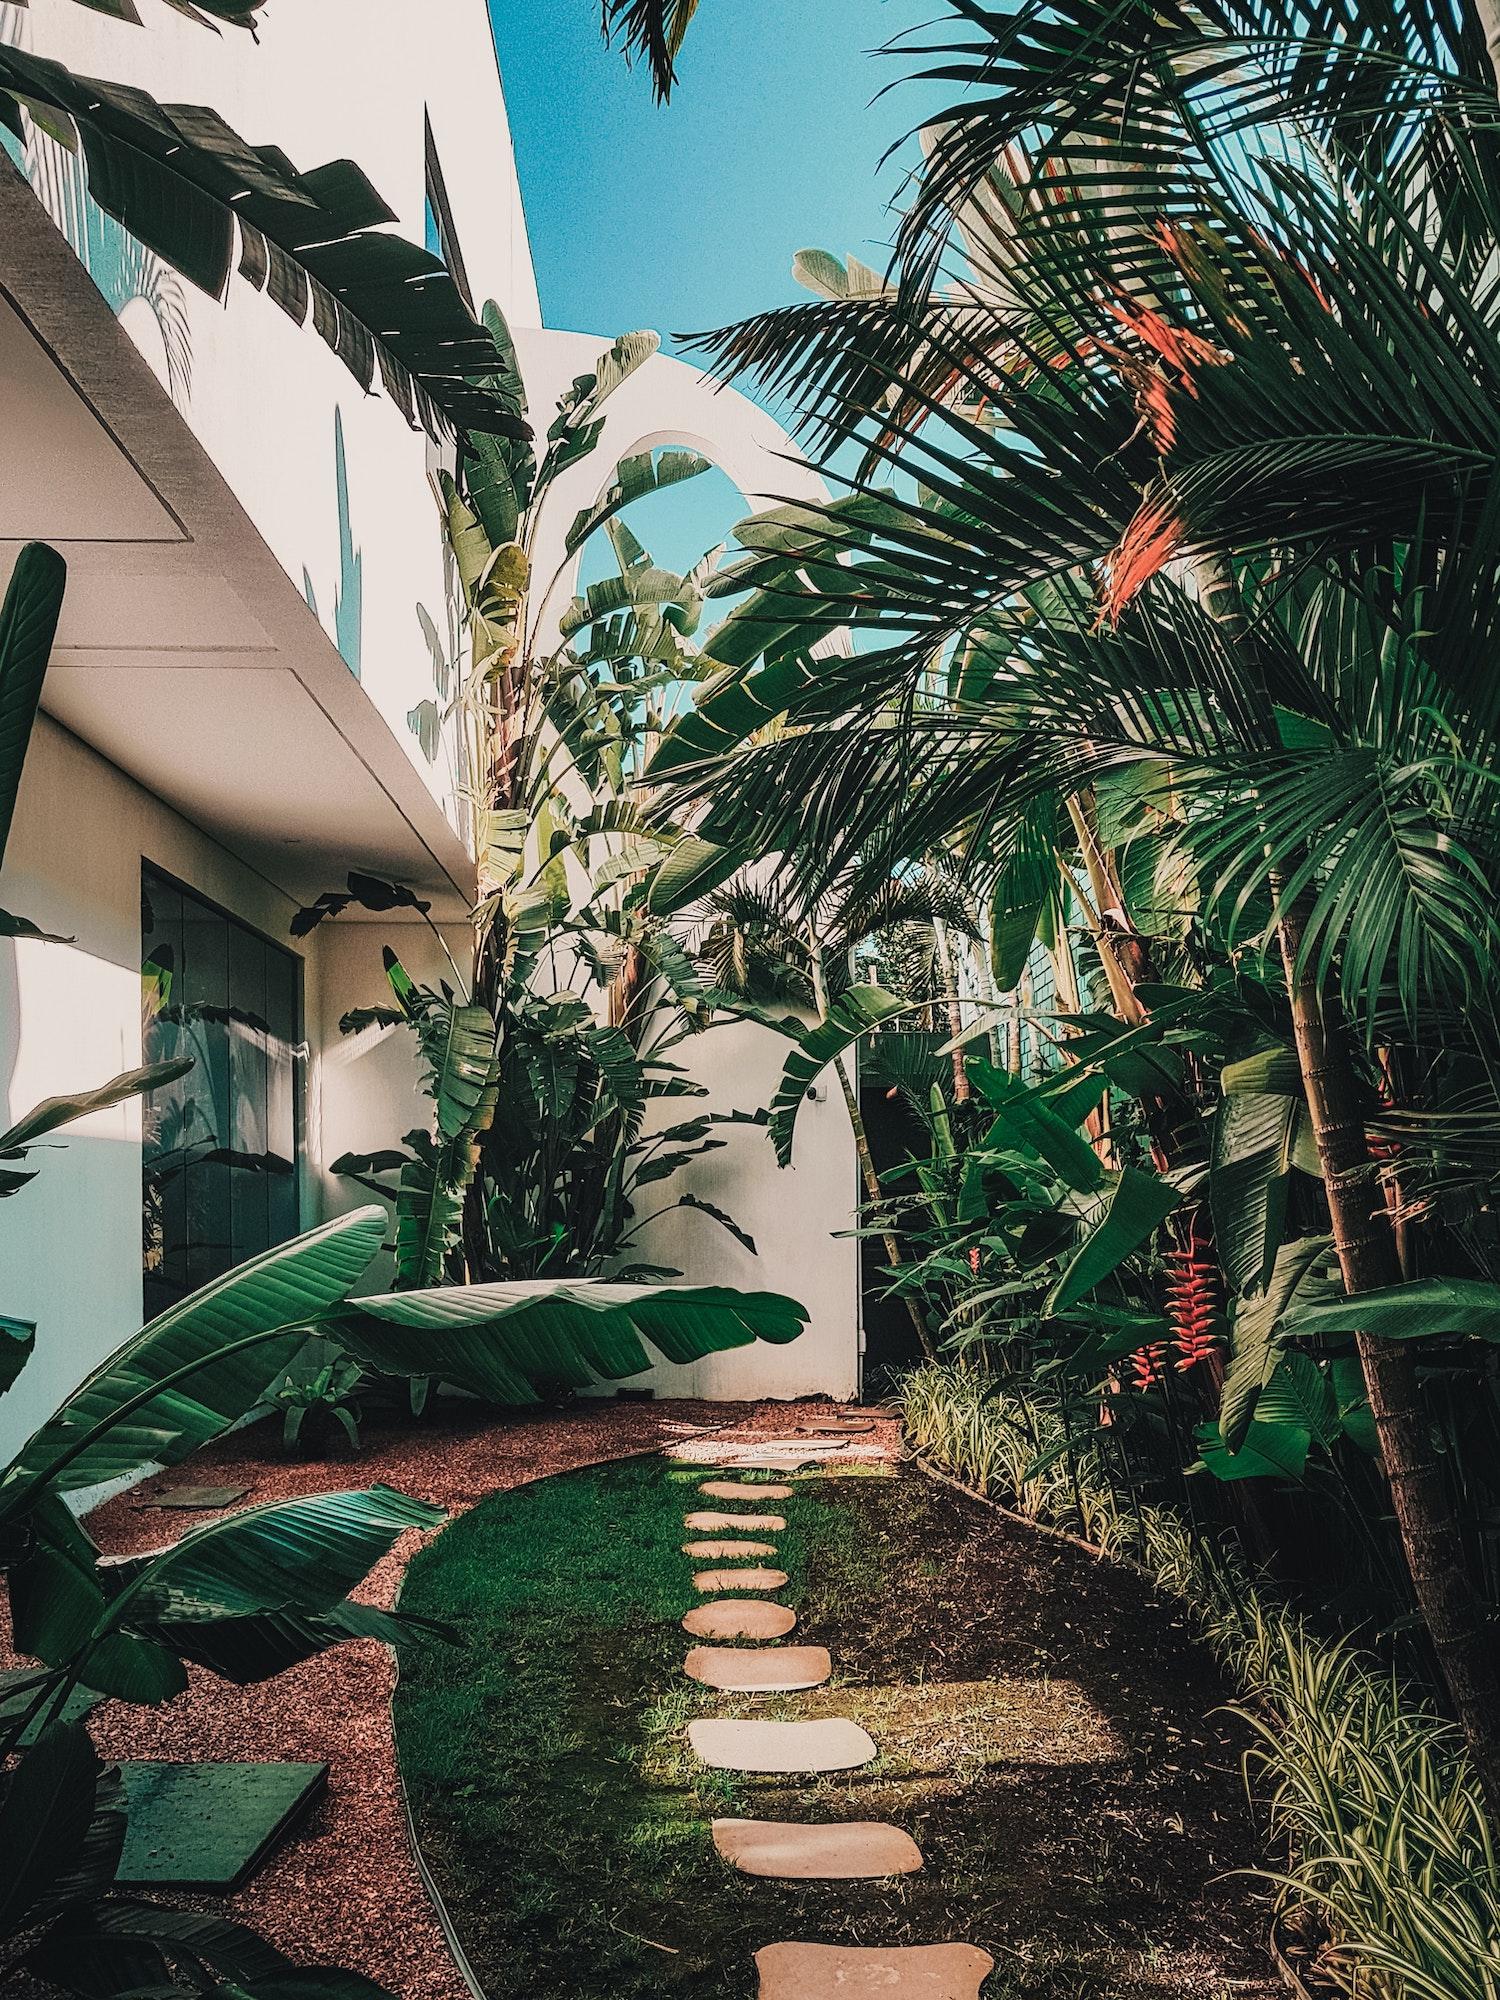 How to create the perfect garden | Home Interior | Elle Blonde Luxury Lifestyle Destination Blog